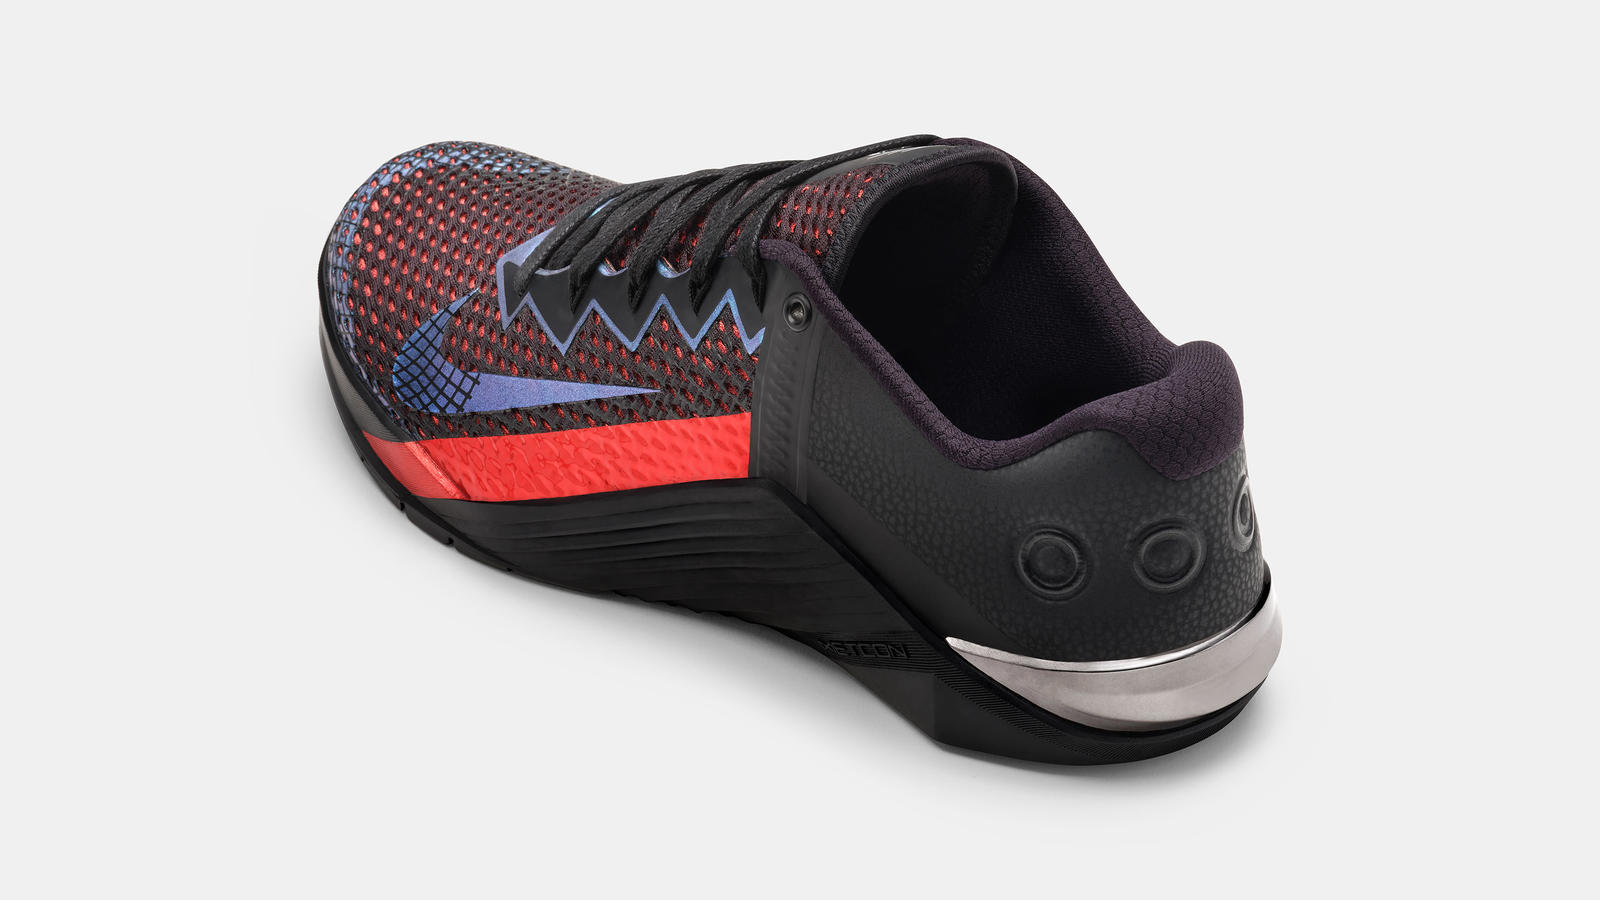 mat fraser nike shoes